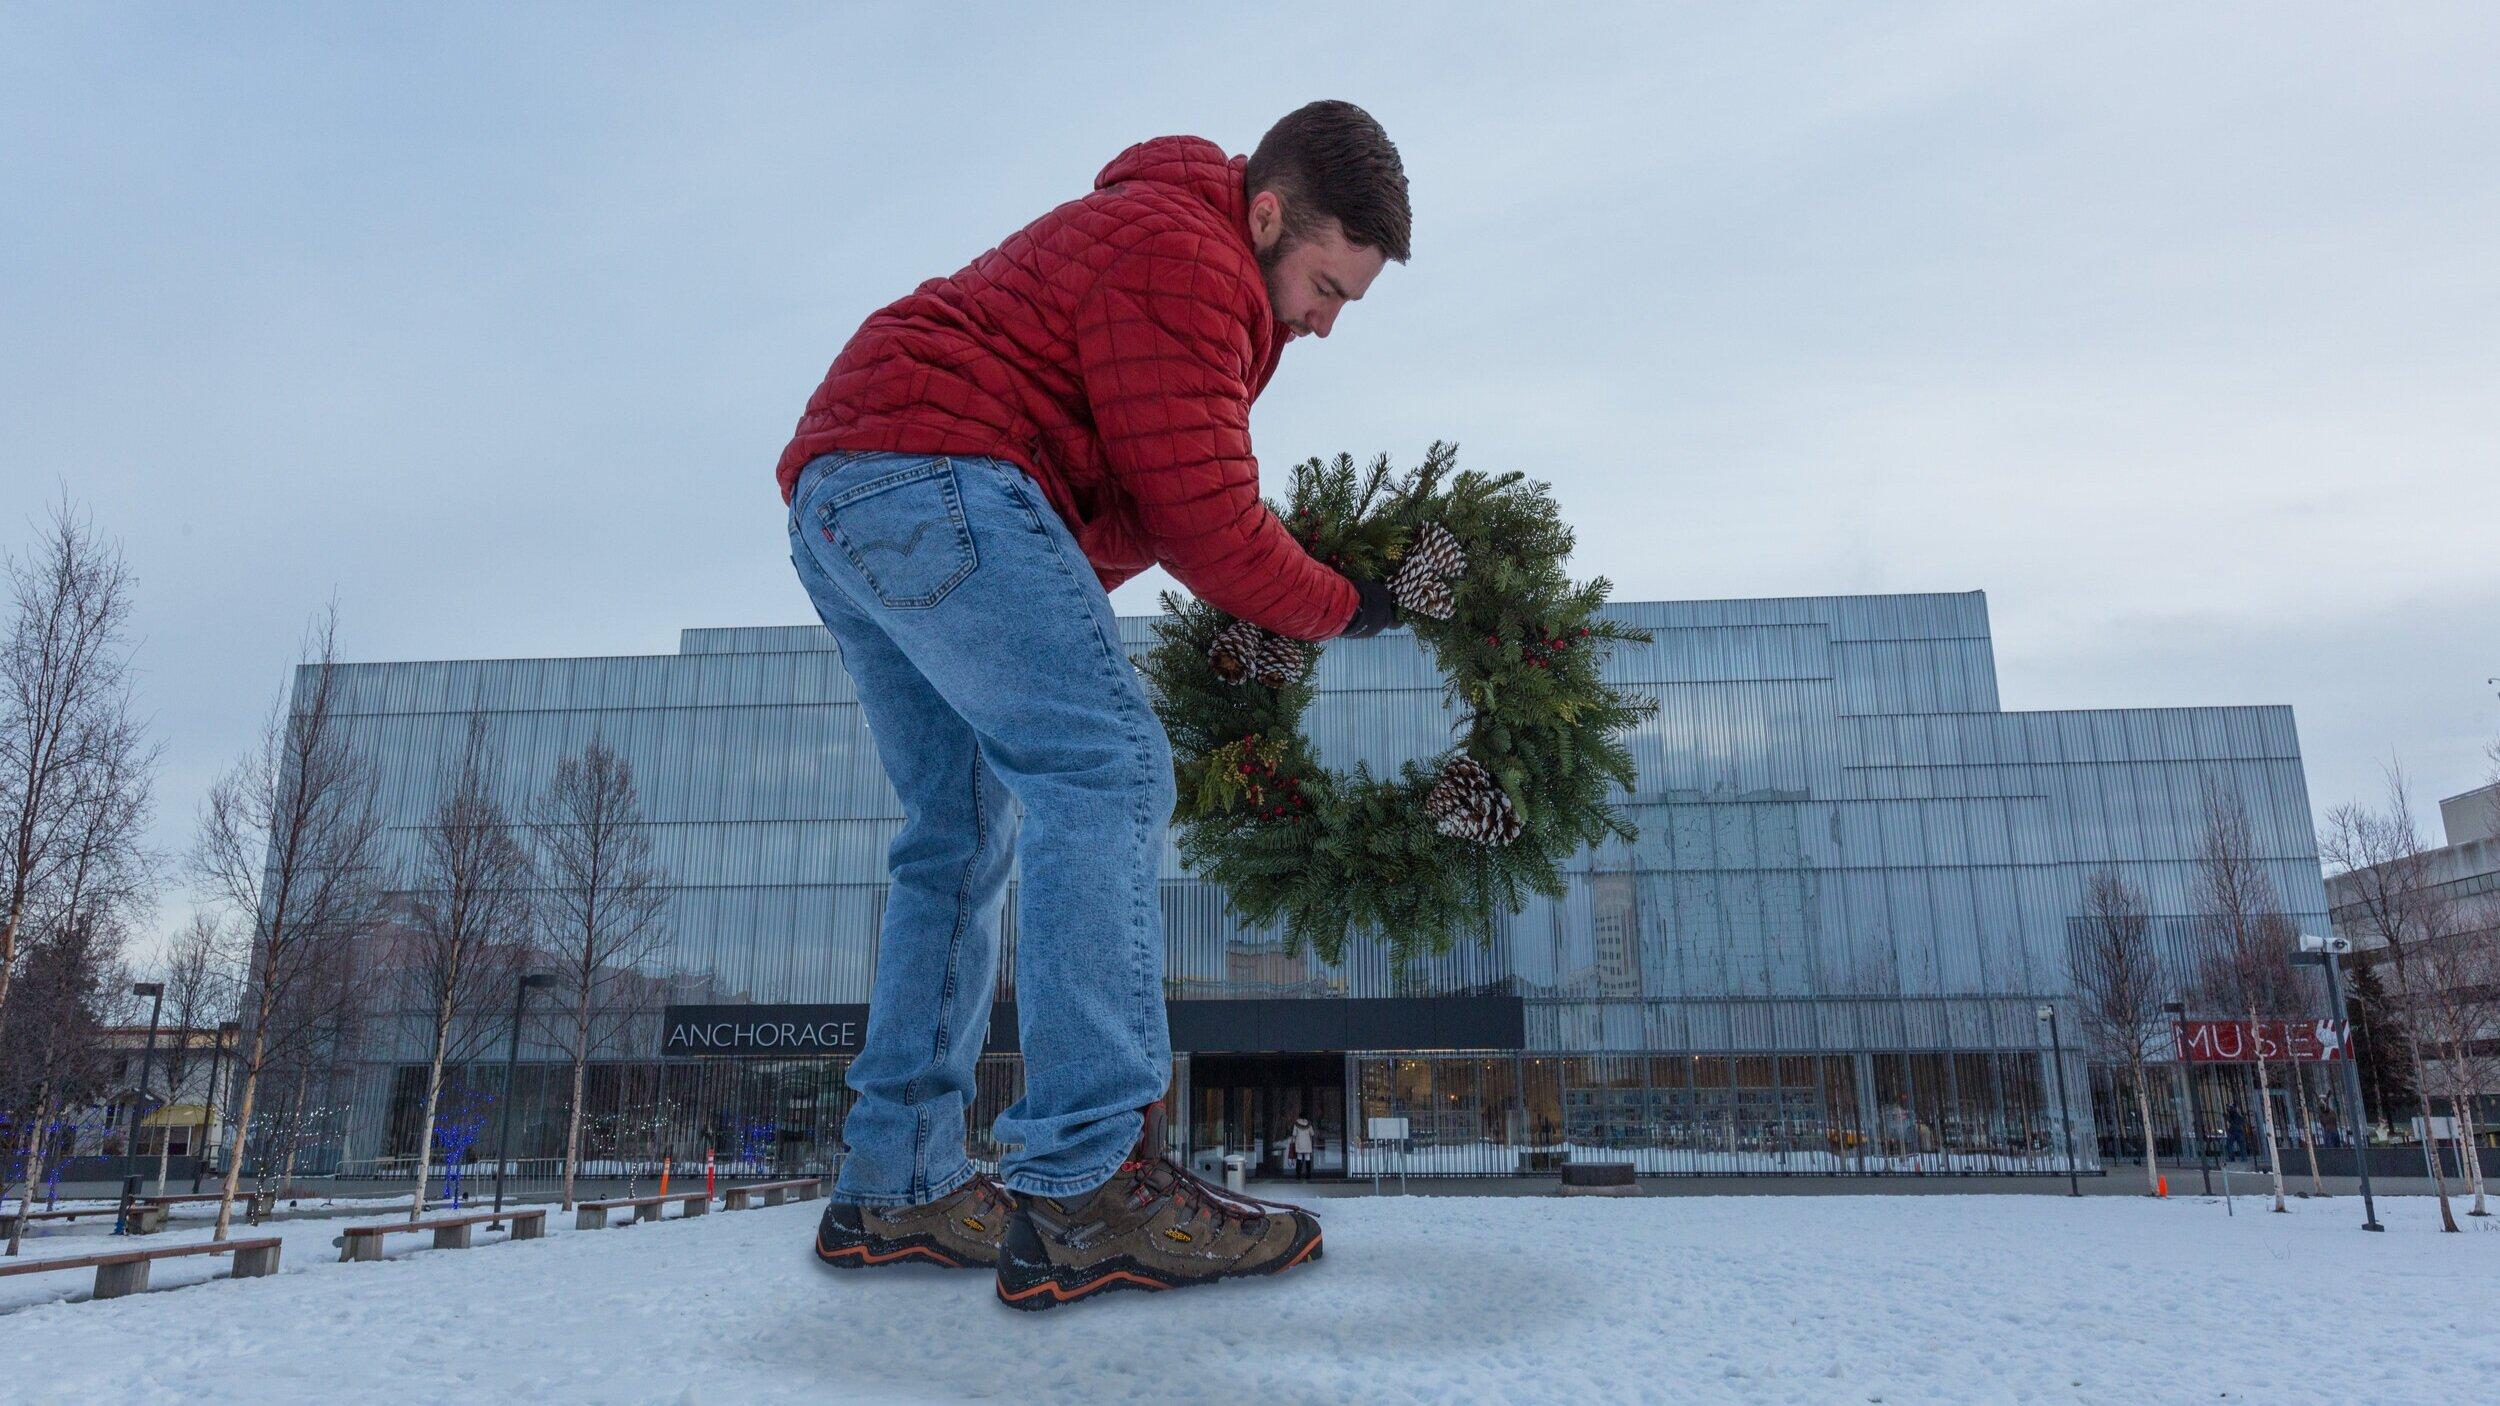 dan-redfield-alaska-photoventures-anchorage-museum-christmas.jpg